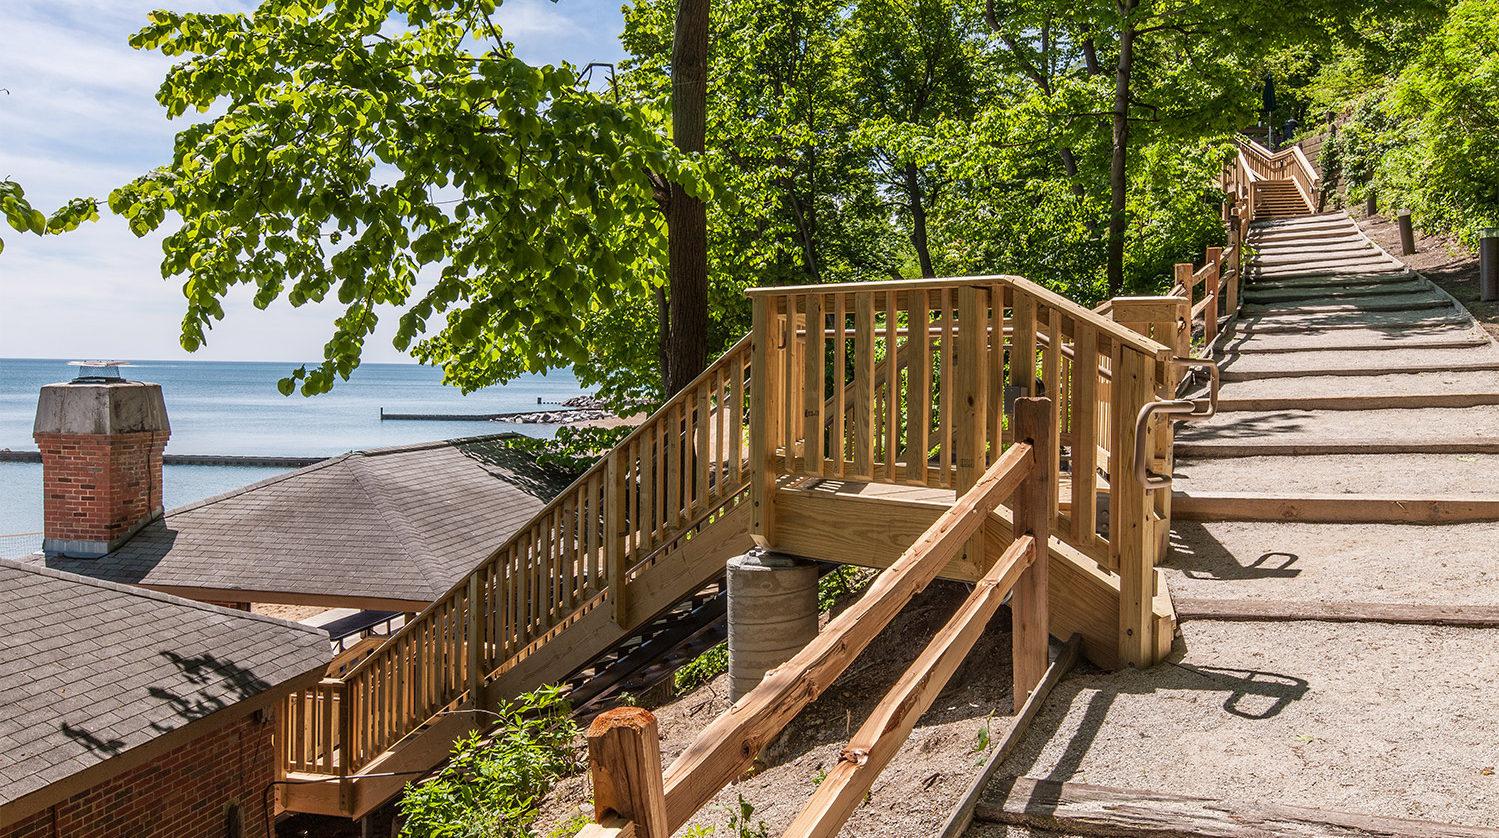 Lake Bluff Stairs